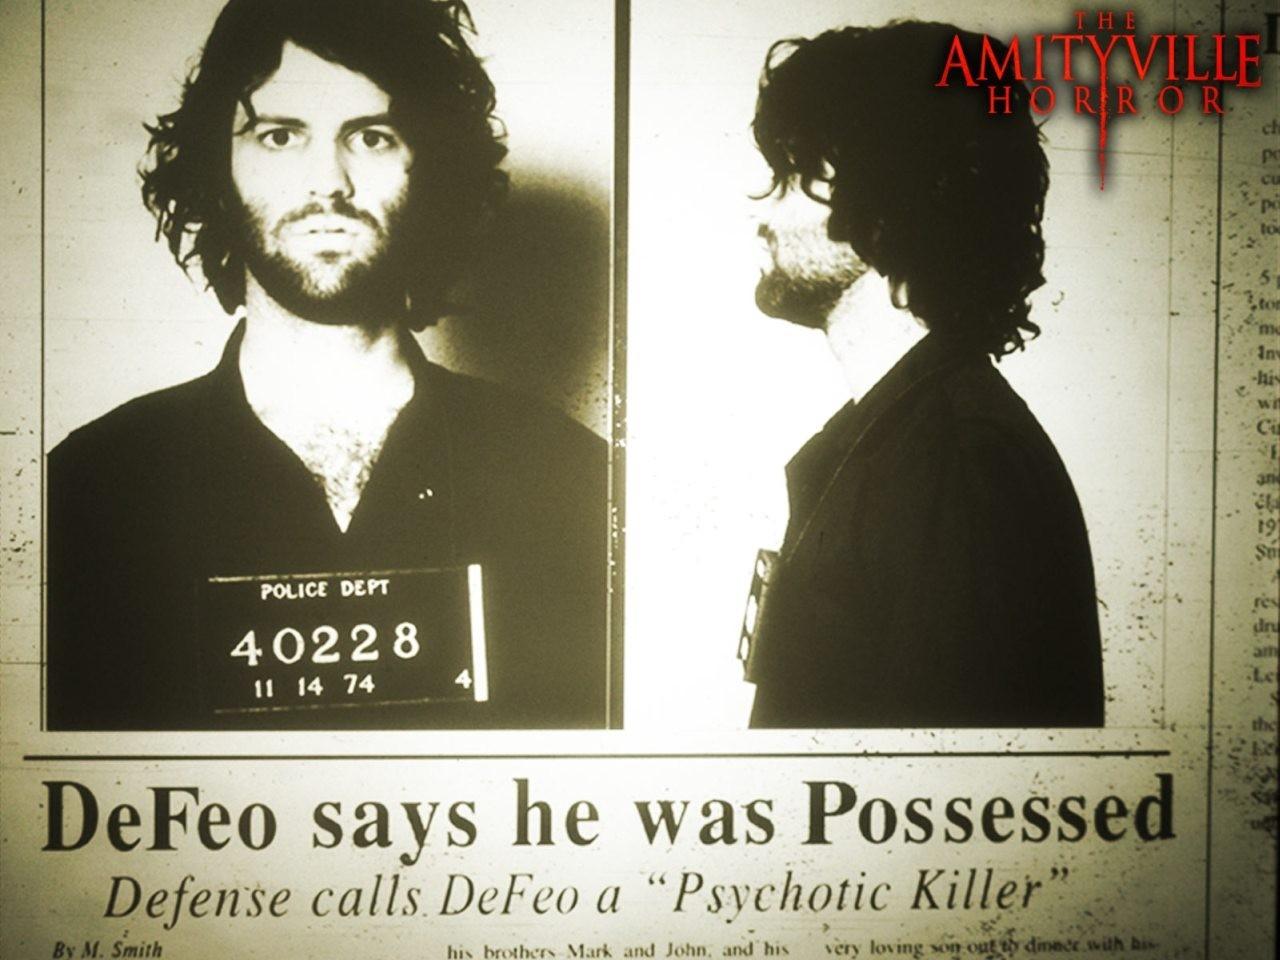 Wallpaper del film Amityville Horror, del 2005